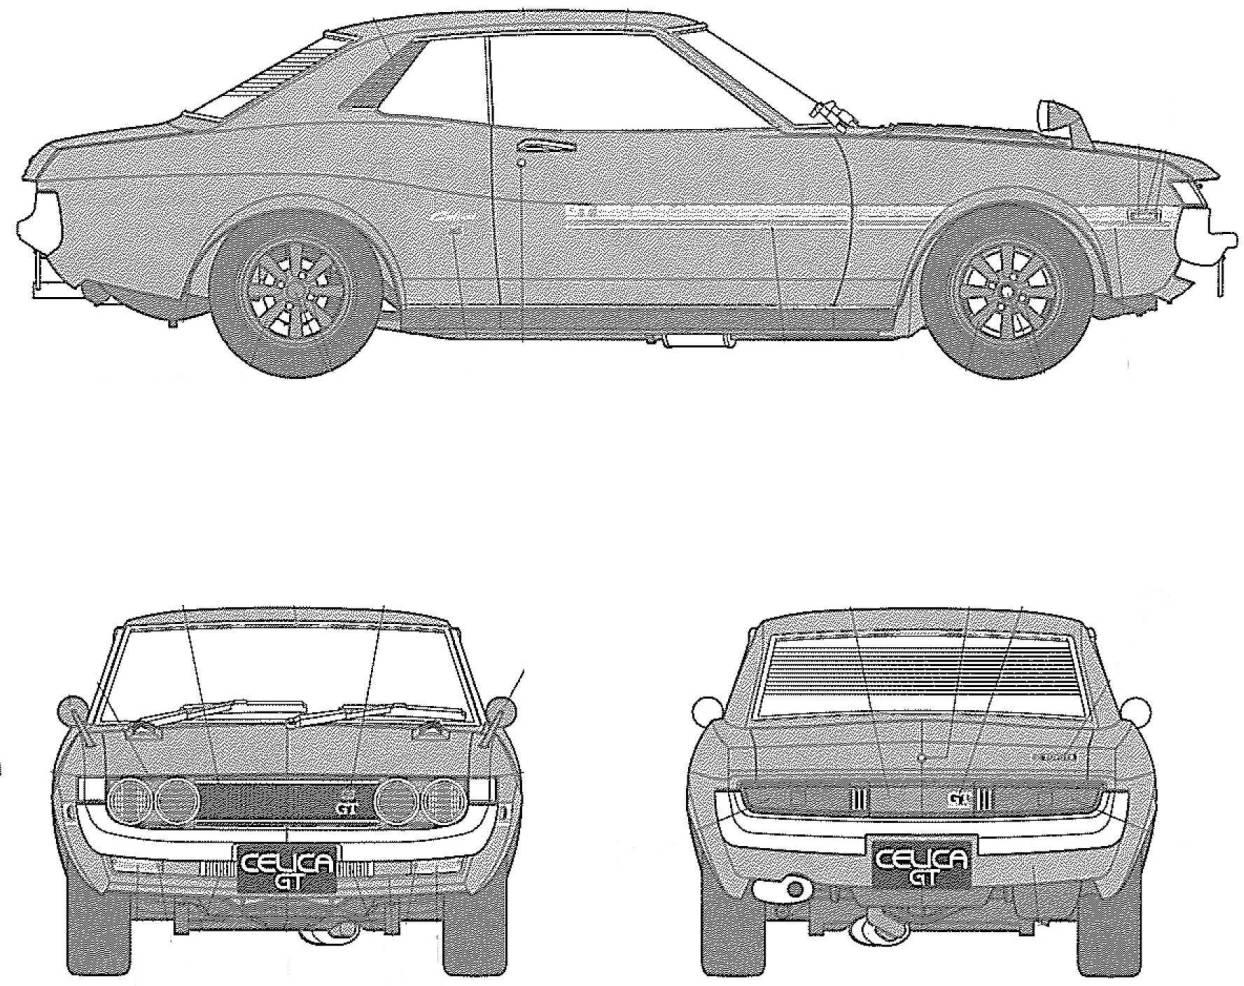 Toyota_Celica 1600 GT_1970a